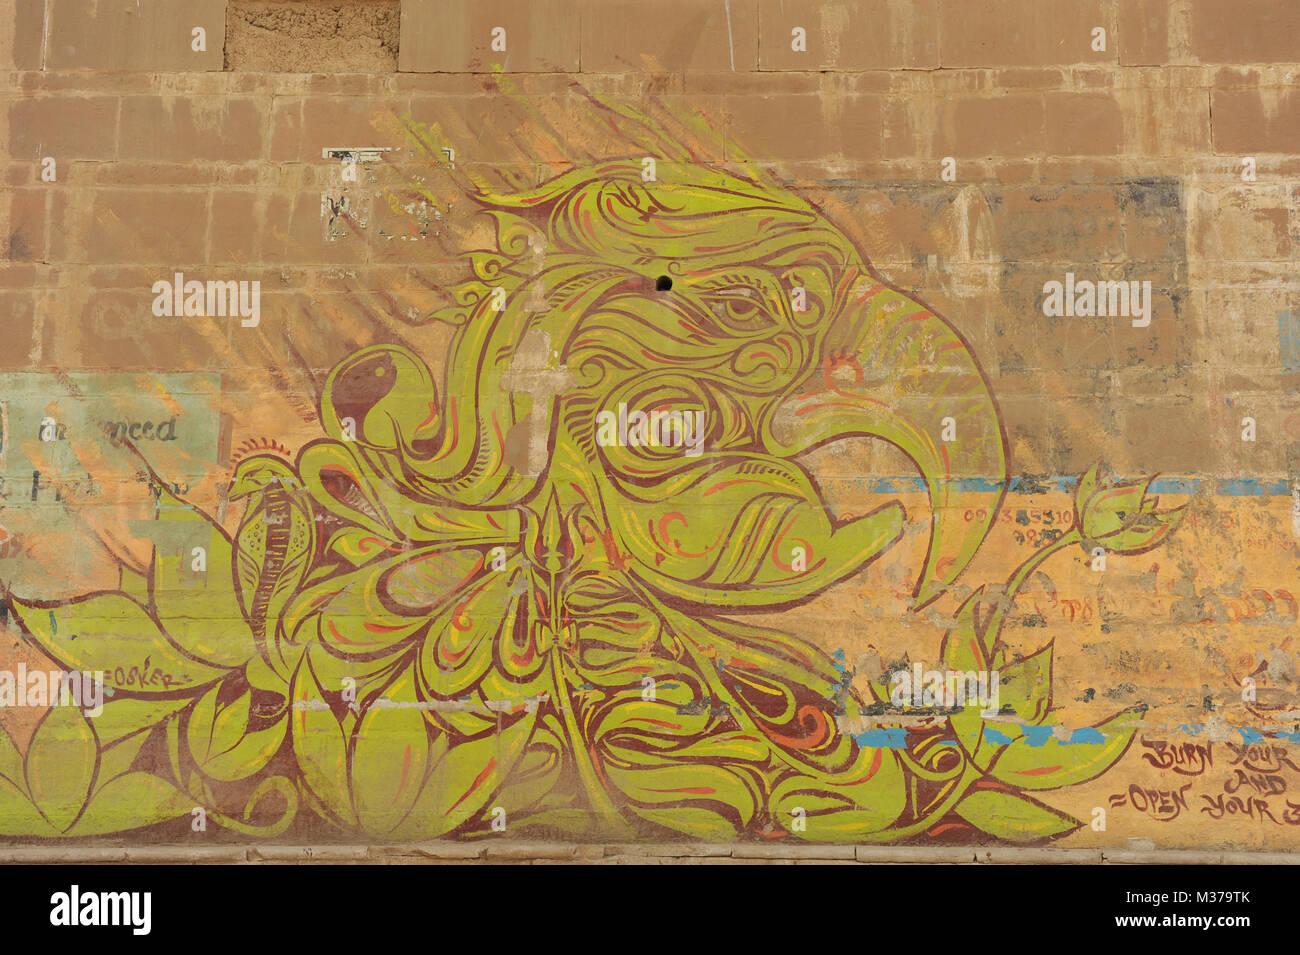 Indian Street Art Wall Stock Photos & Indian Street Art Wall Stock ...